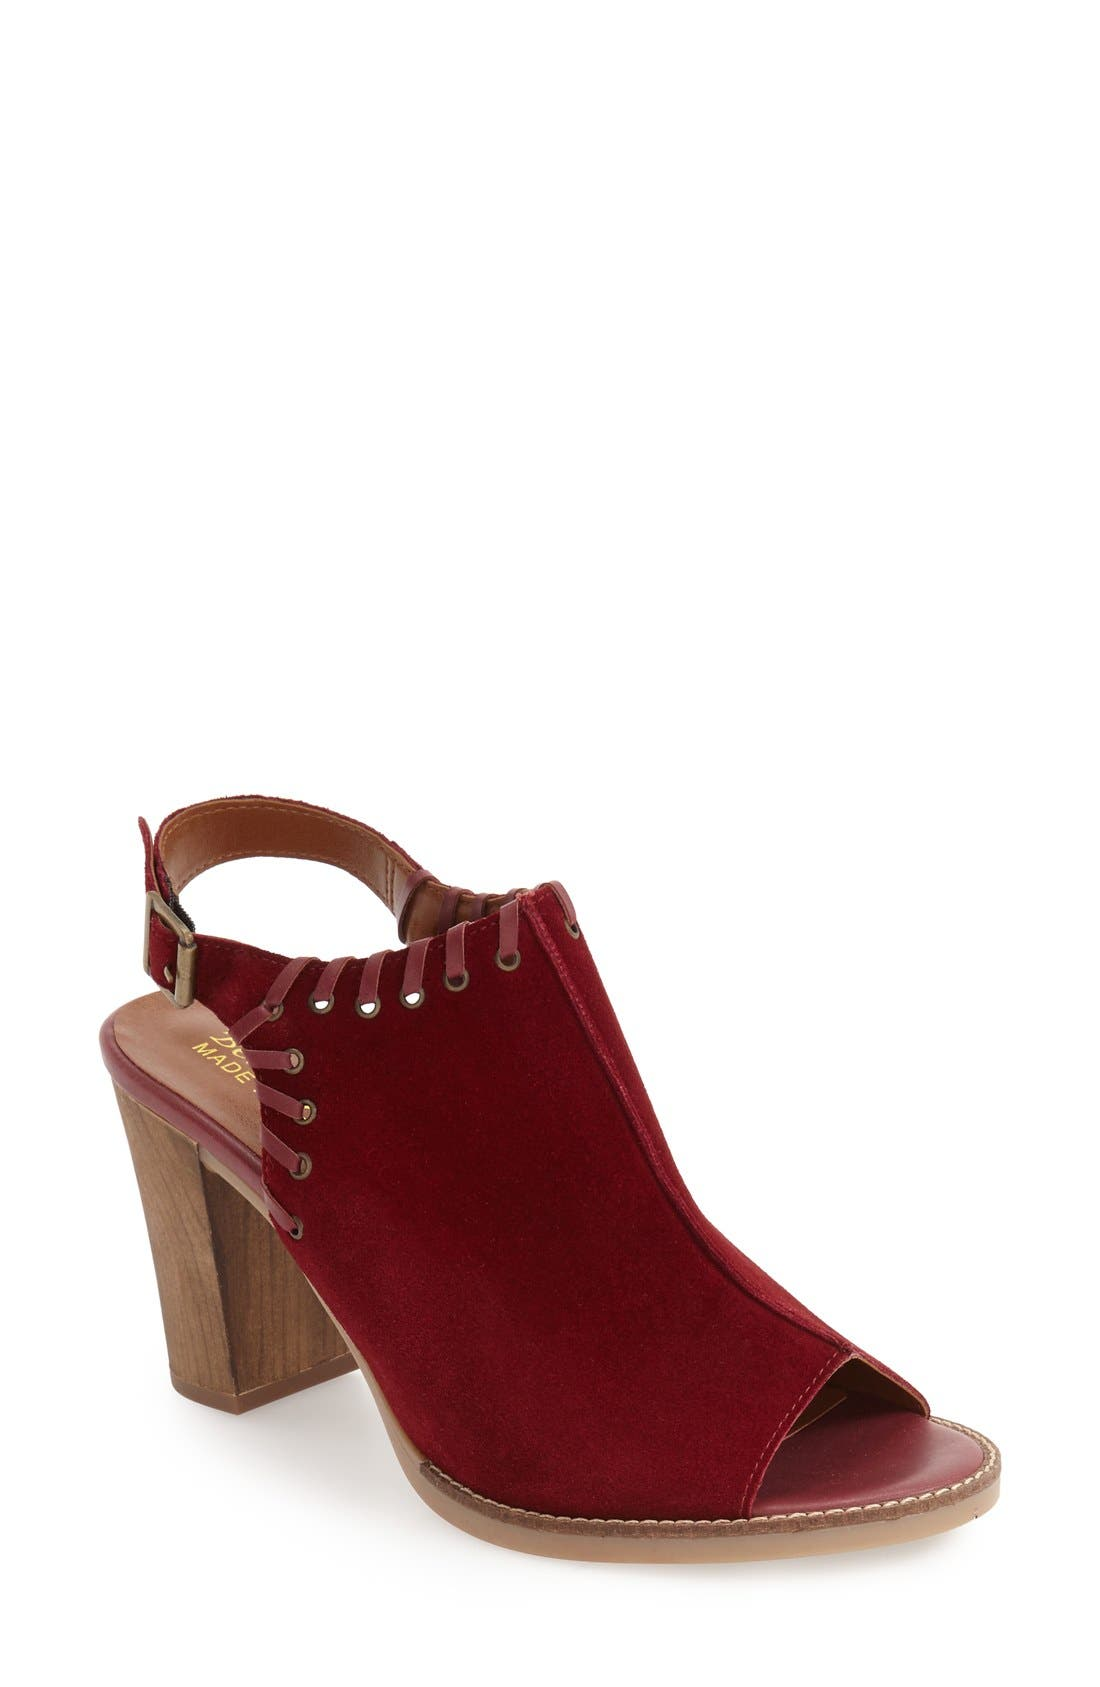 BELLA VITA Ora Block Heel Slingback Sandal